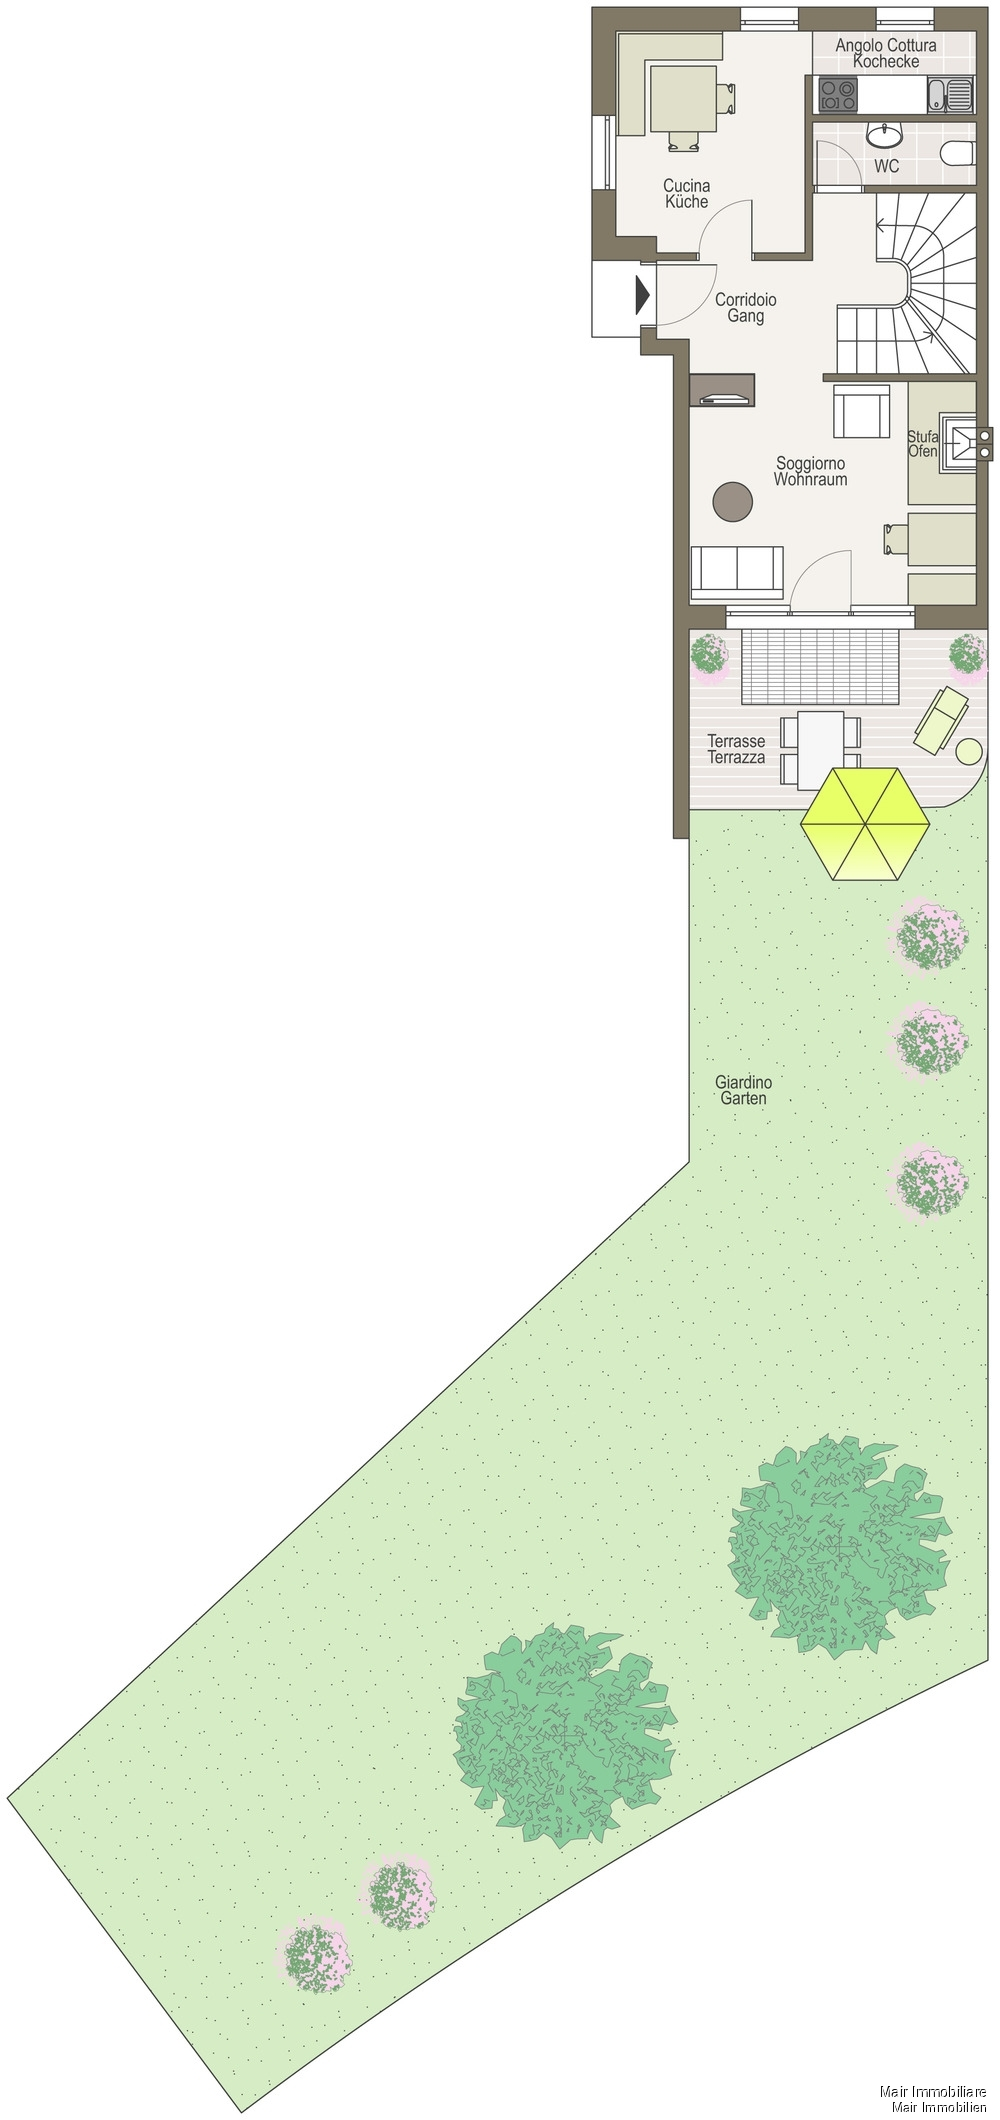 Piano terra - Erdgeschoss